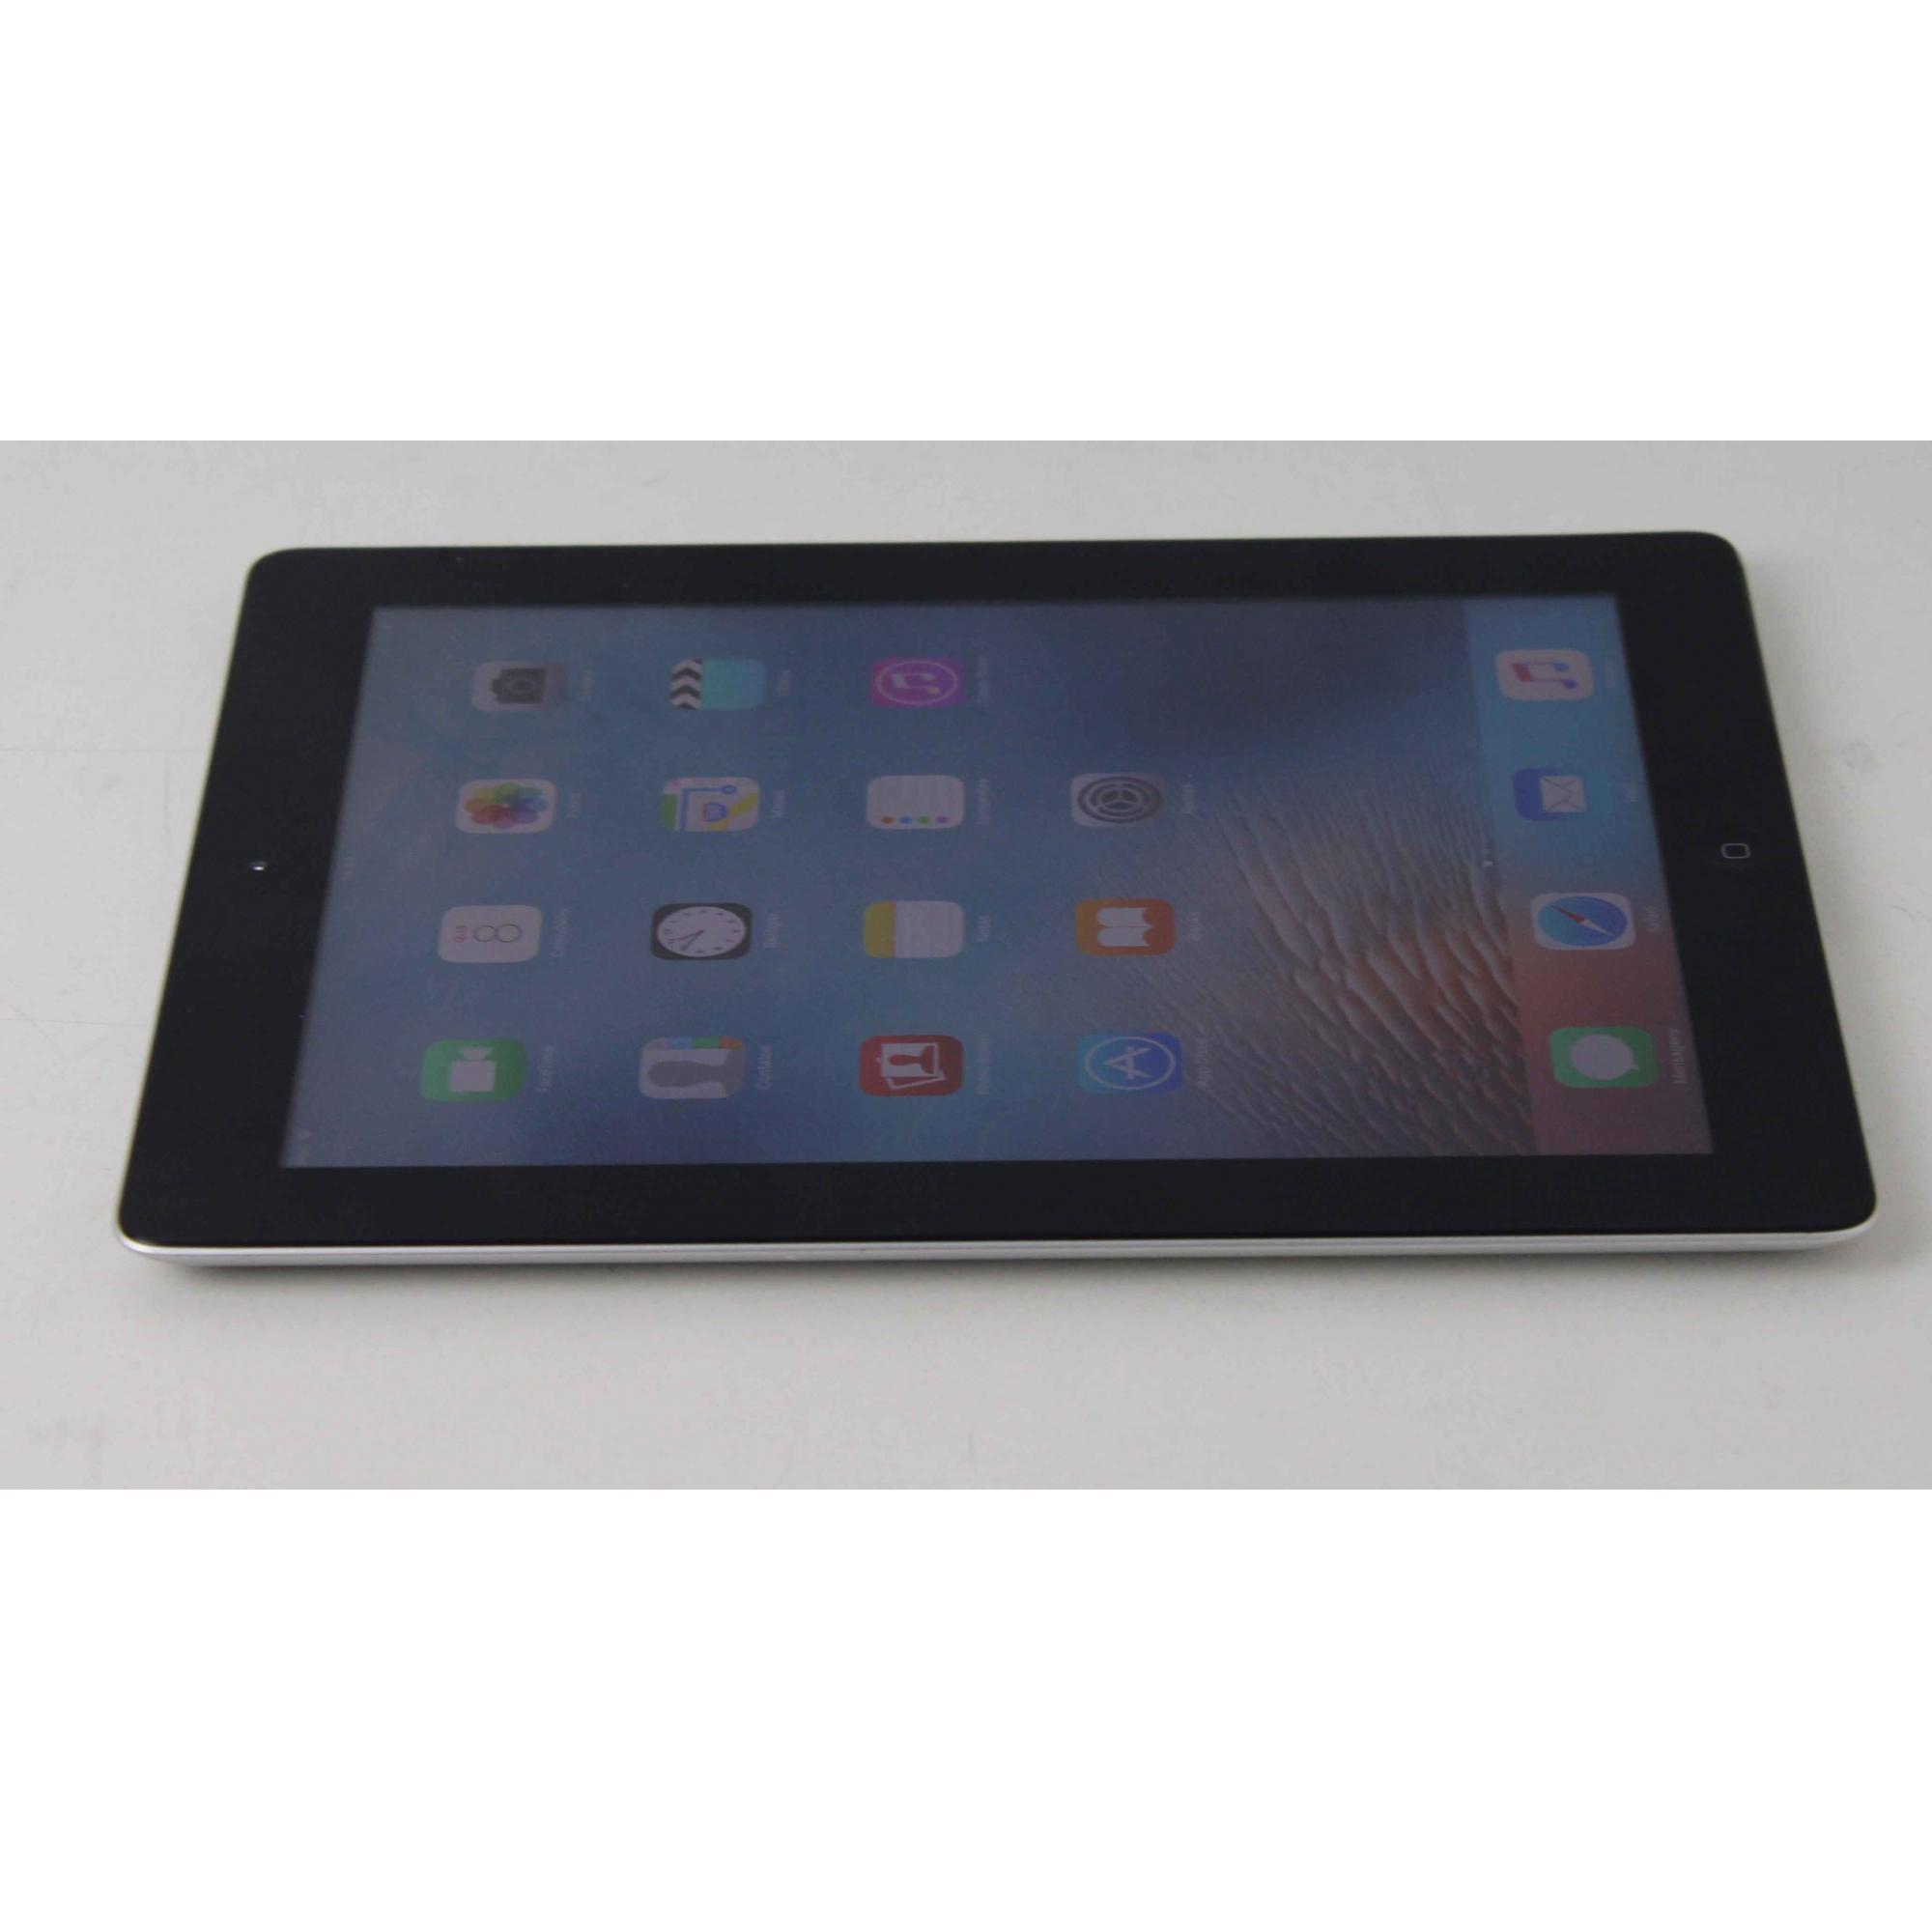 "iPad 3 MC706LL/A 9.7"" 32GB Wifi - Cinza espacial"